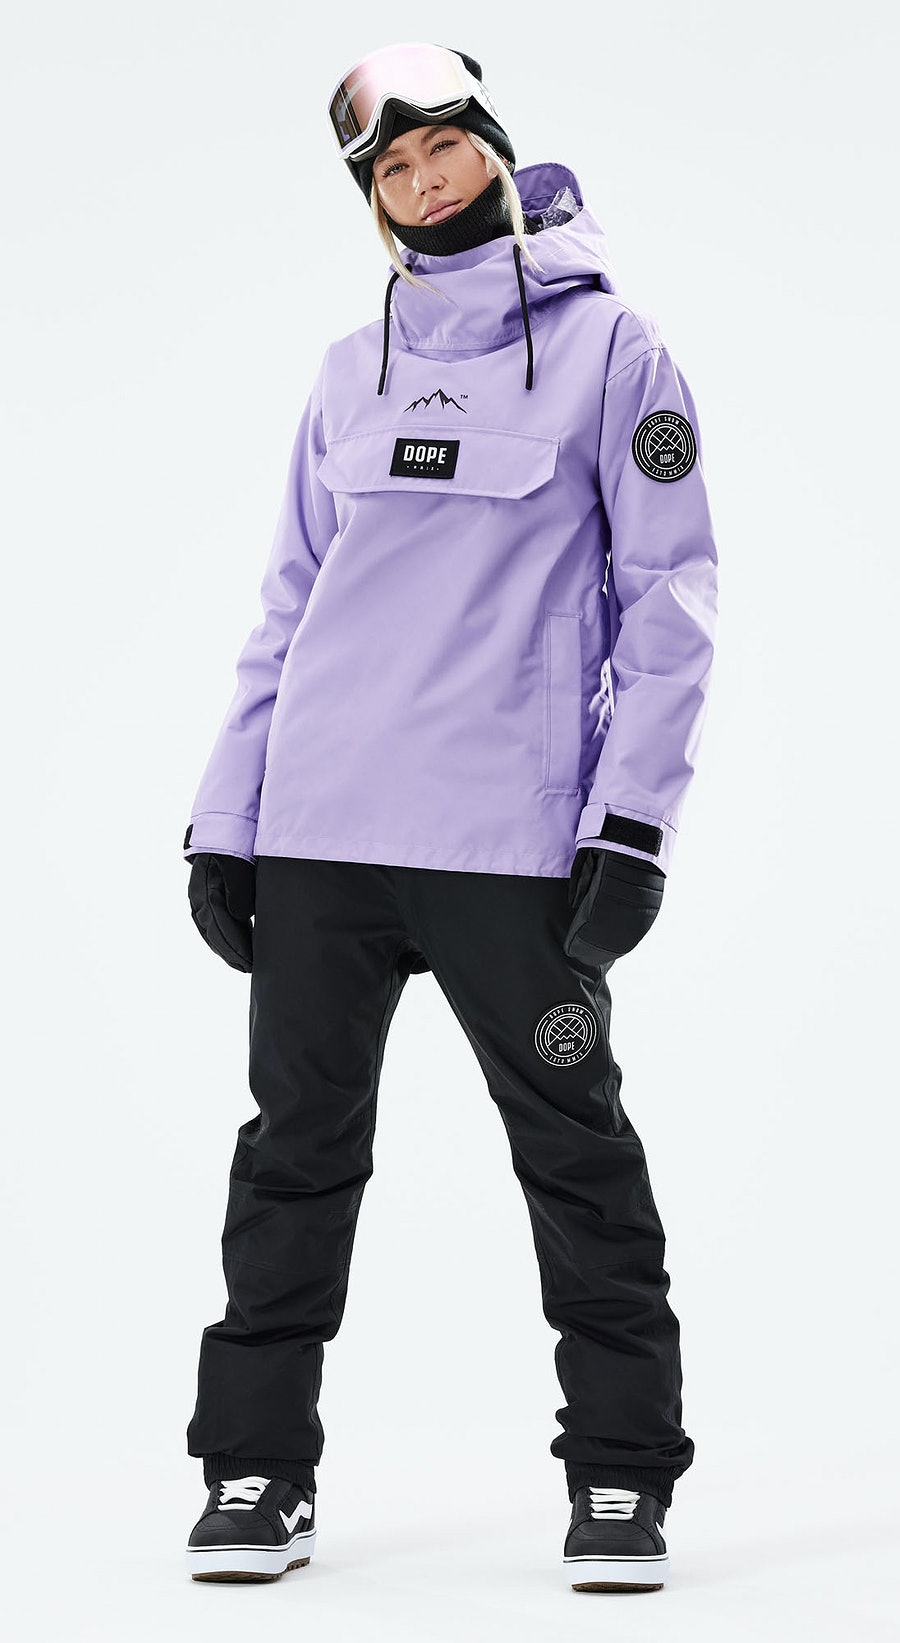 Dope Blizzard PO W Outfit Multi